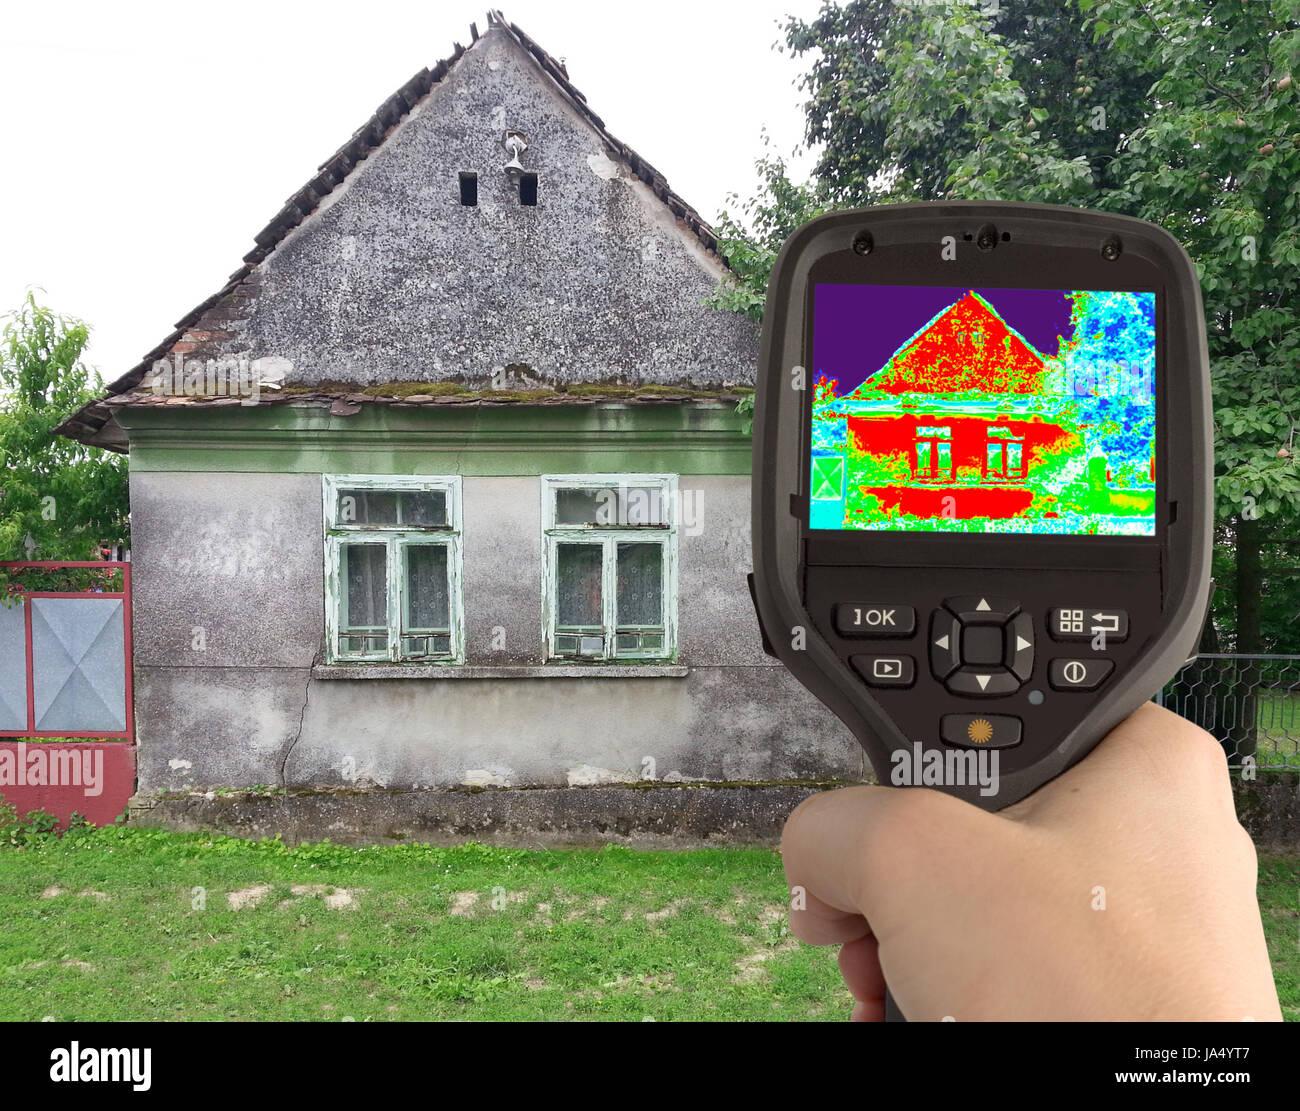 Infrarot, Wärmeverlust, Thermografie, Haus, Gebäude, Energie, Strom,  Elektrizität,